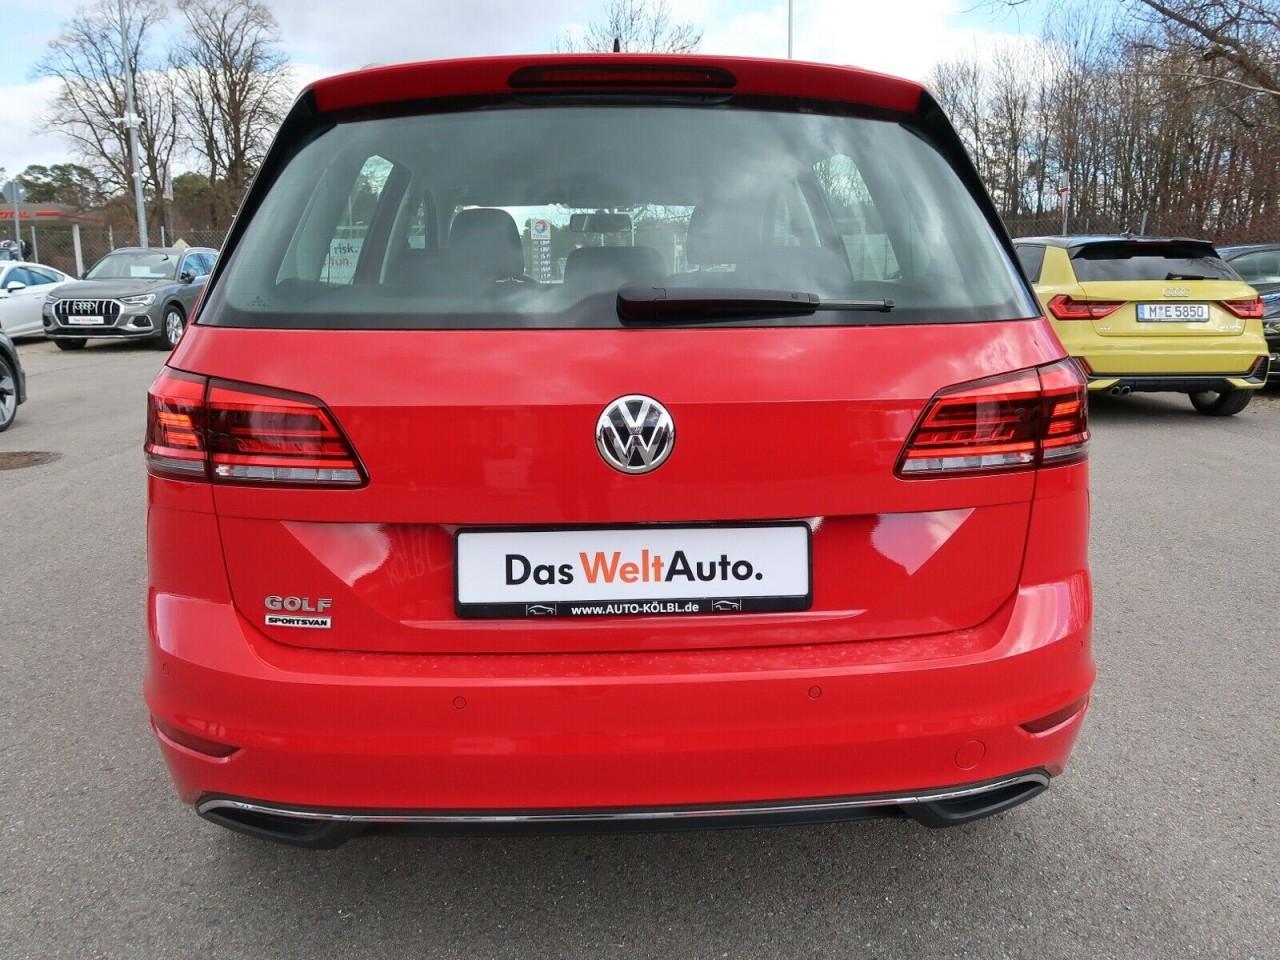 VW GOLF SPORTSVAN 1,0 TSI COMKLIMACSITZH